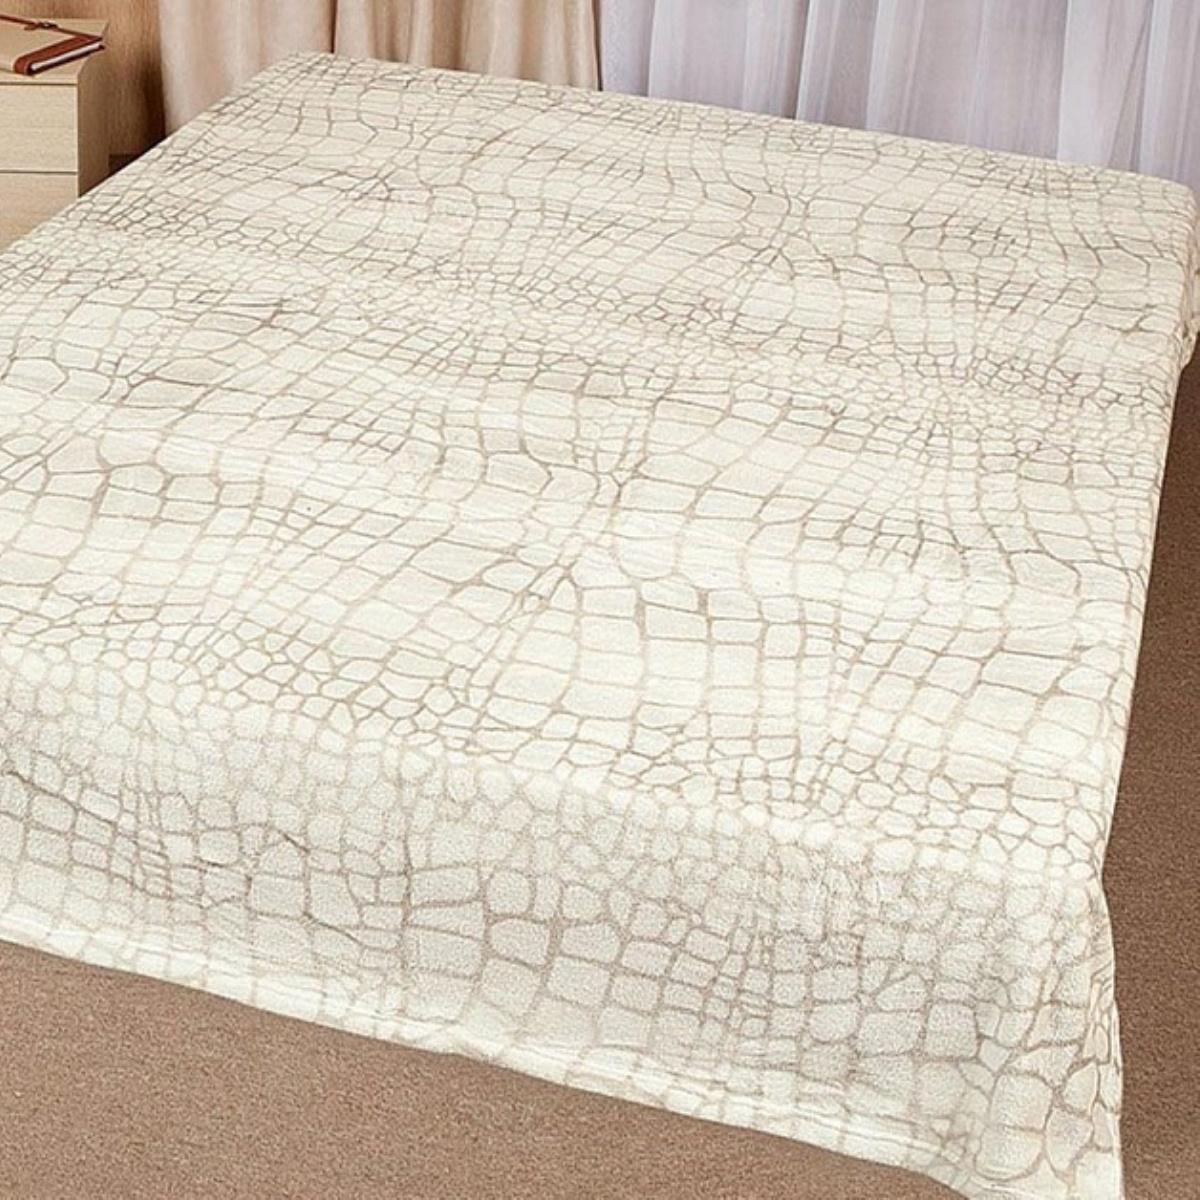 Плед Letto Велсофт, цвет: серый, 175 х 200 см. V114-4 плед hongda уют 2x2 2m white 877312